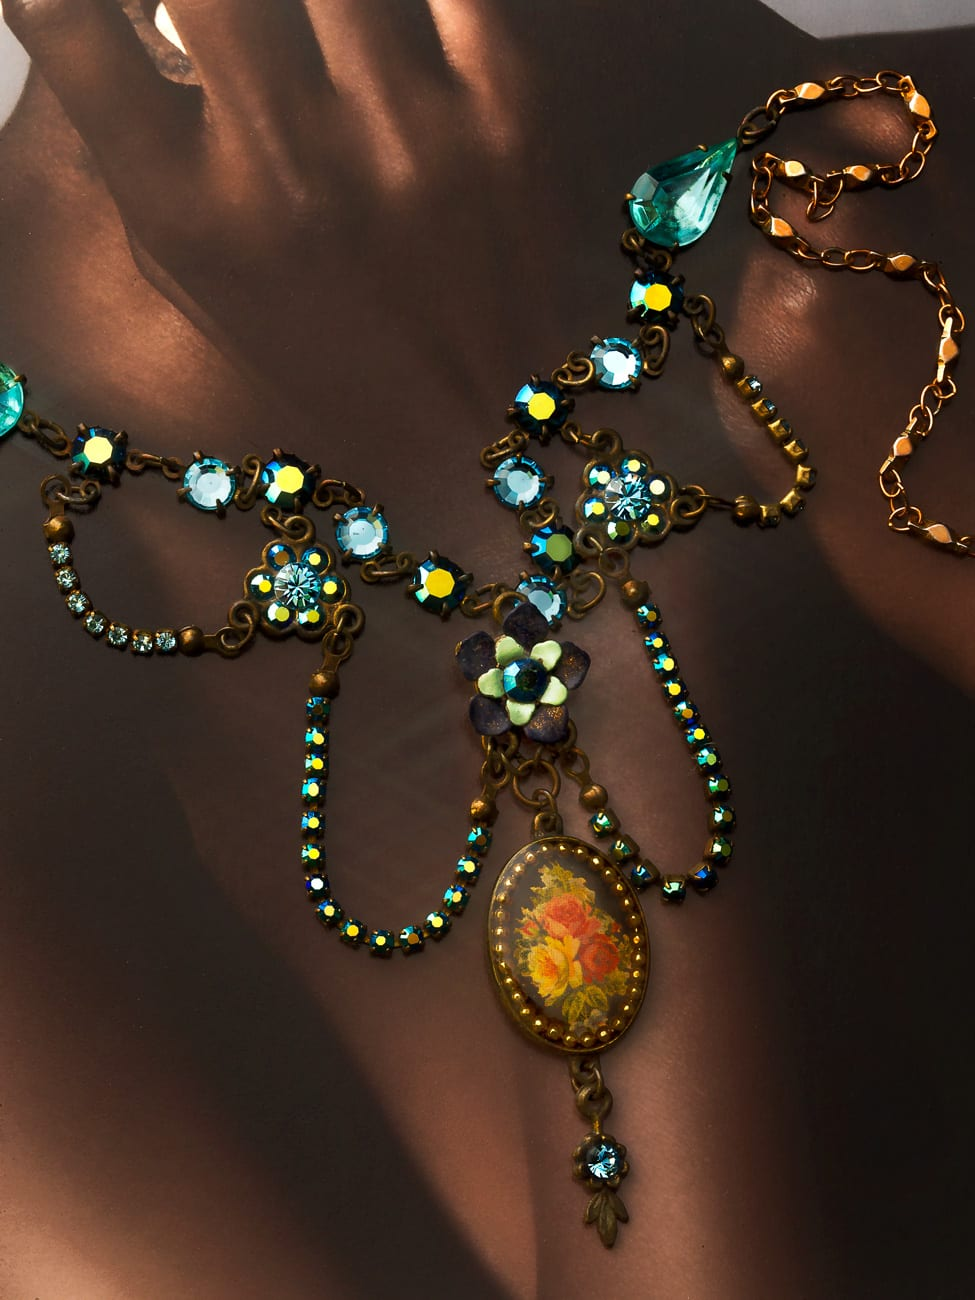 Jewelry-on-Image-10